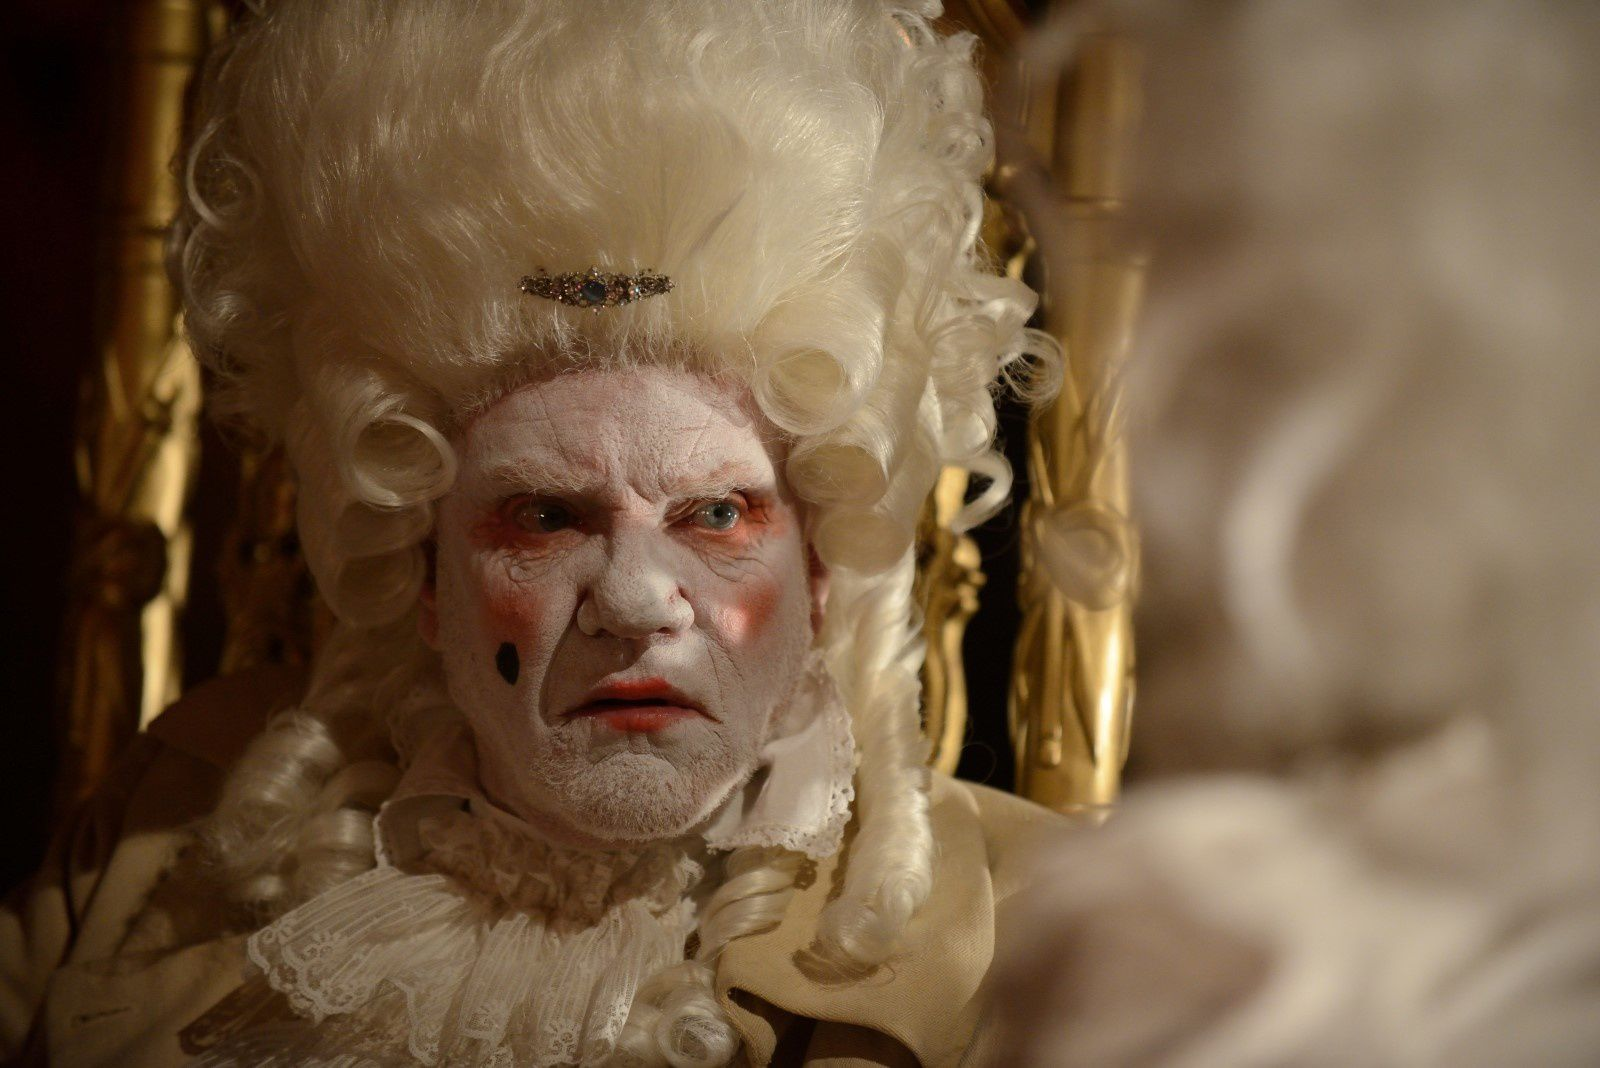 31 (BANDE ANNONCE VF 2016) de Rob Zombie avec Sheri Moon Zombie, Malcolm McDowell, Elizabeth Daily